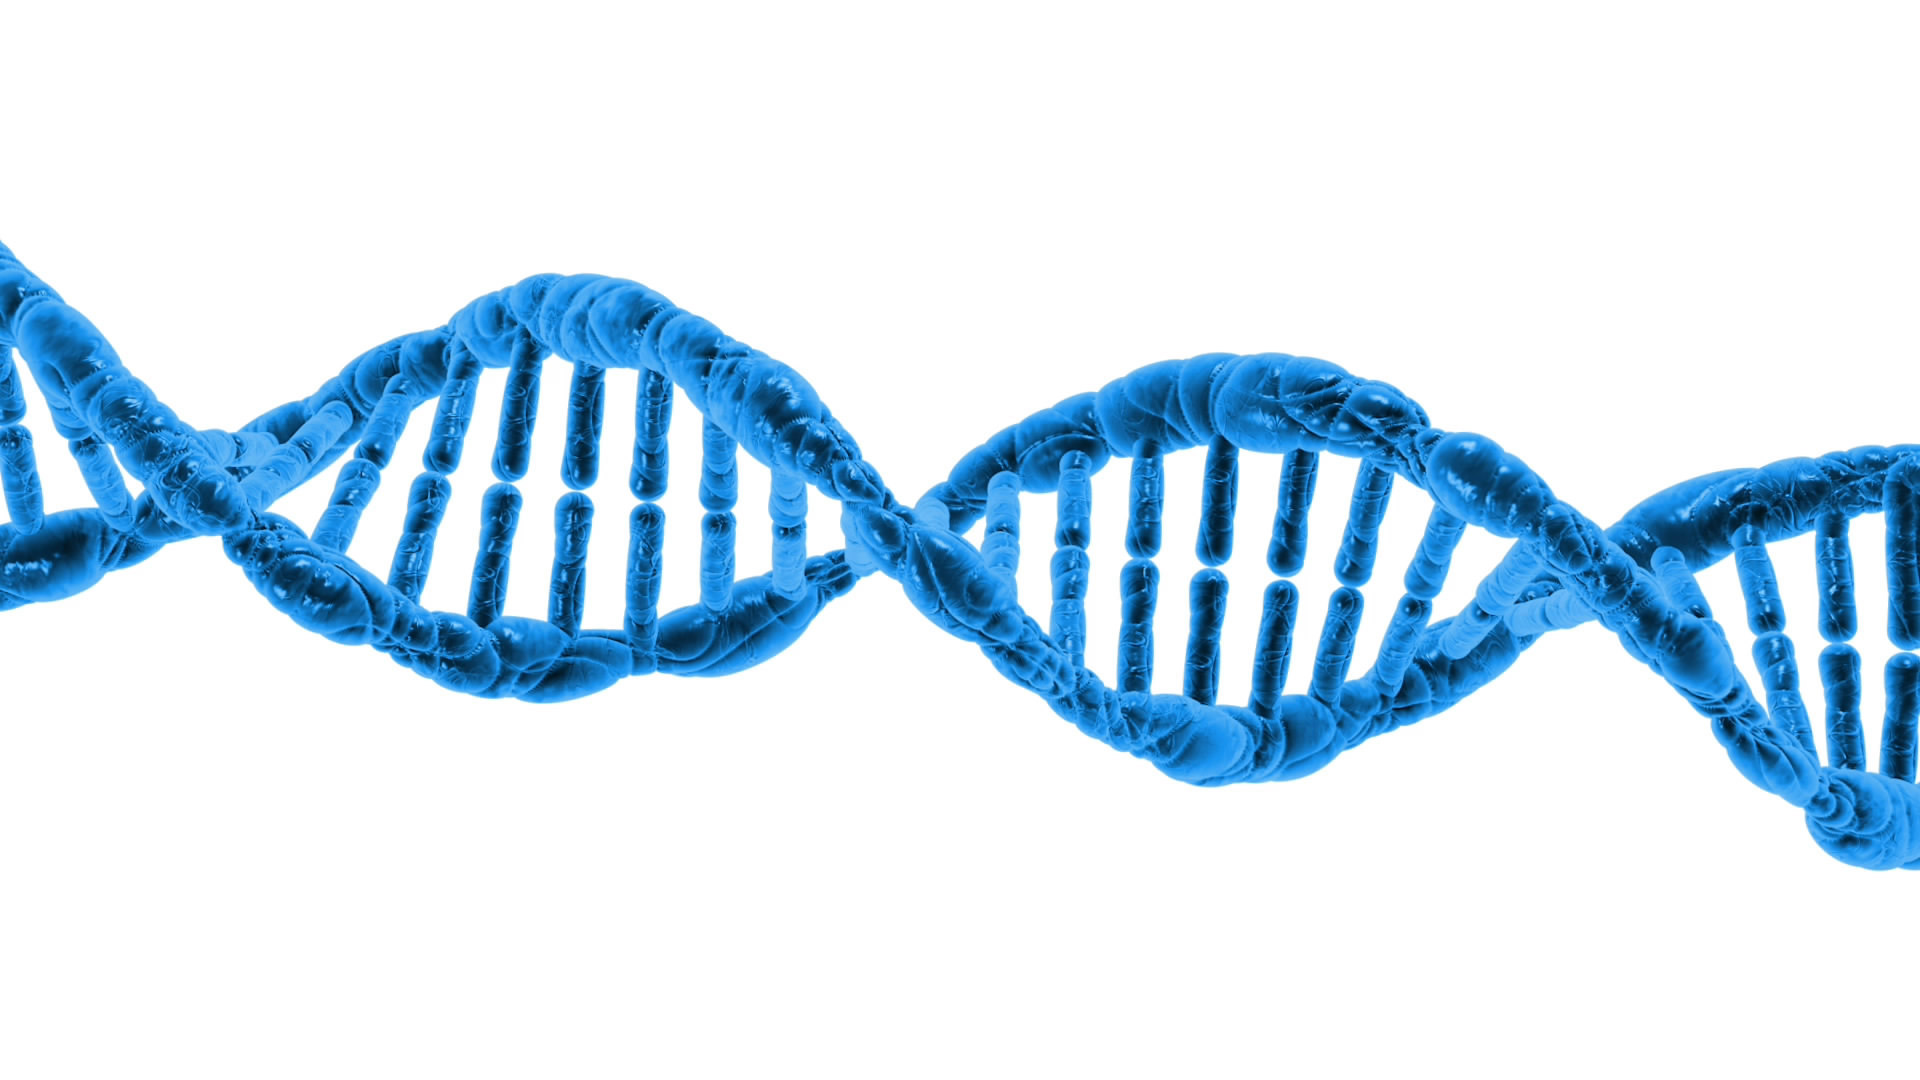 NOU: testare genetica EuroFIT și SkinAGING